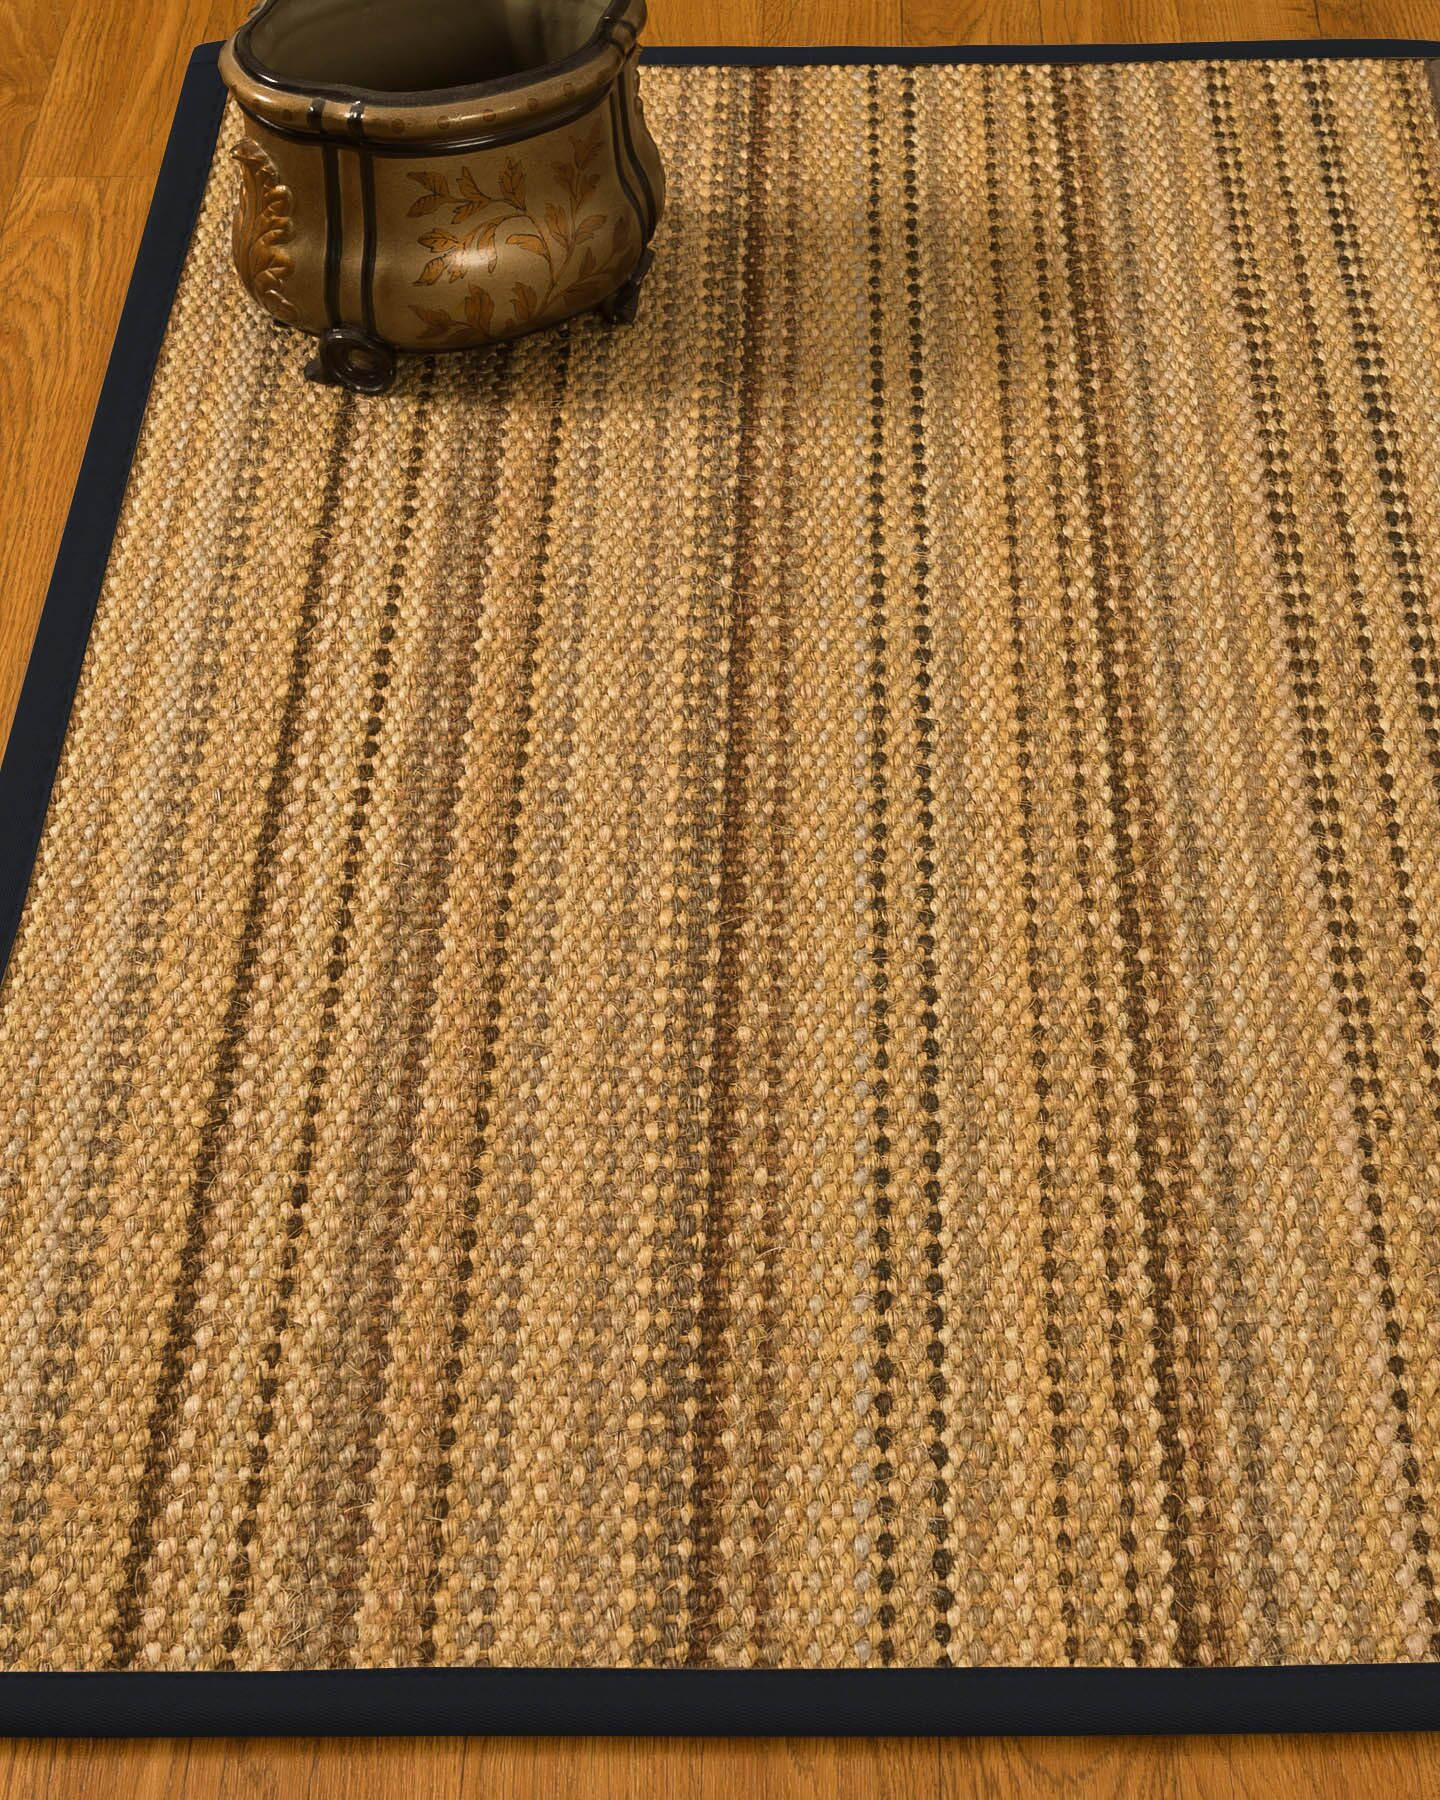 Kimmel Hand-Woven Beige Area Rug Rug Size: Rectangle 9' x 12'